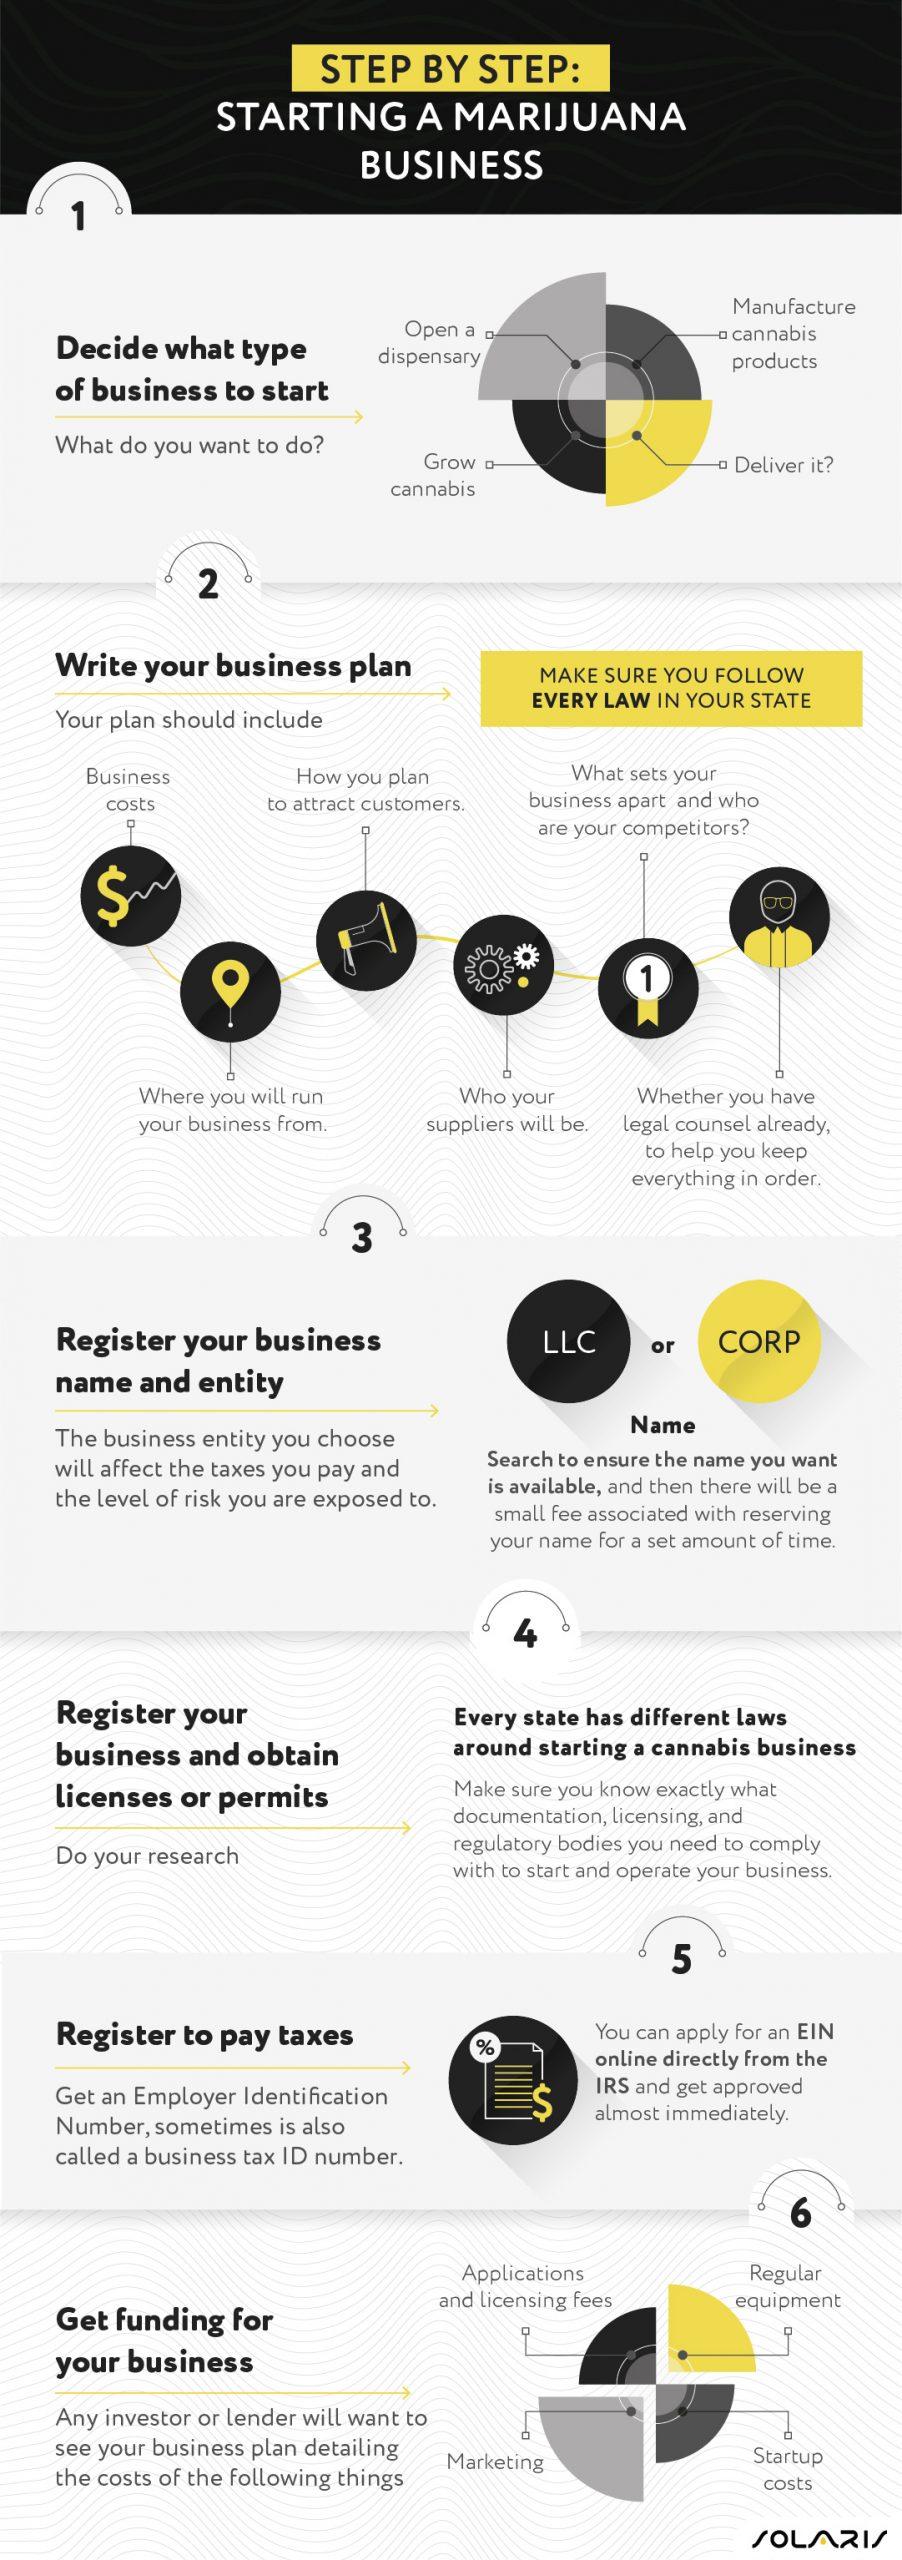 Step by step: Starting a marijuana business